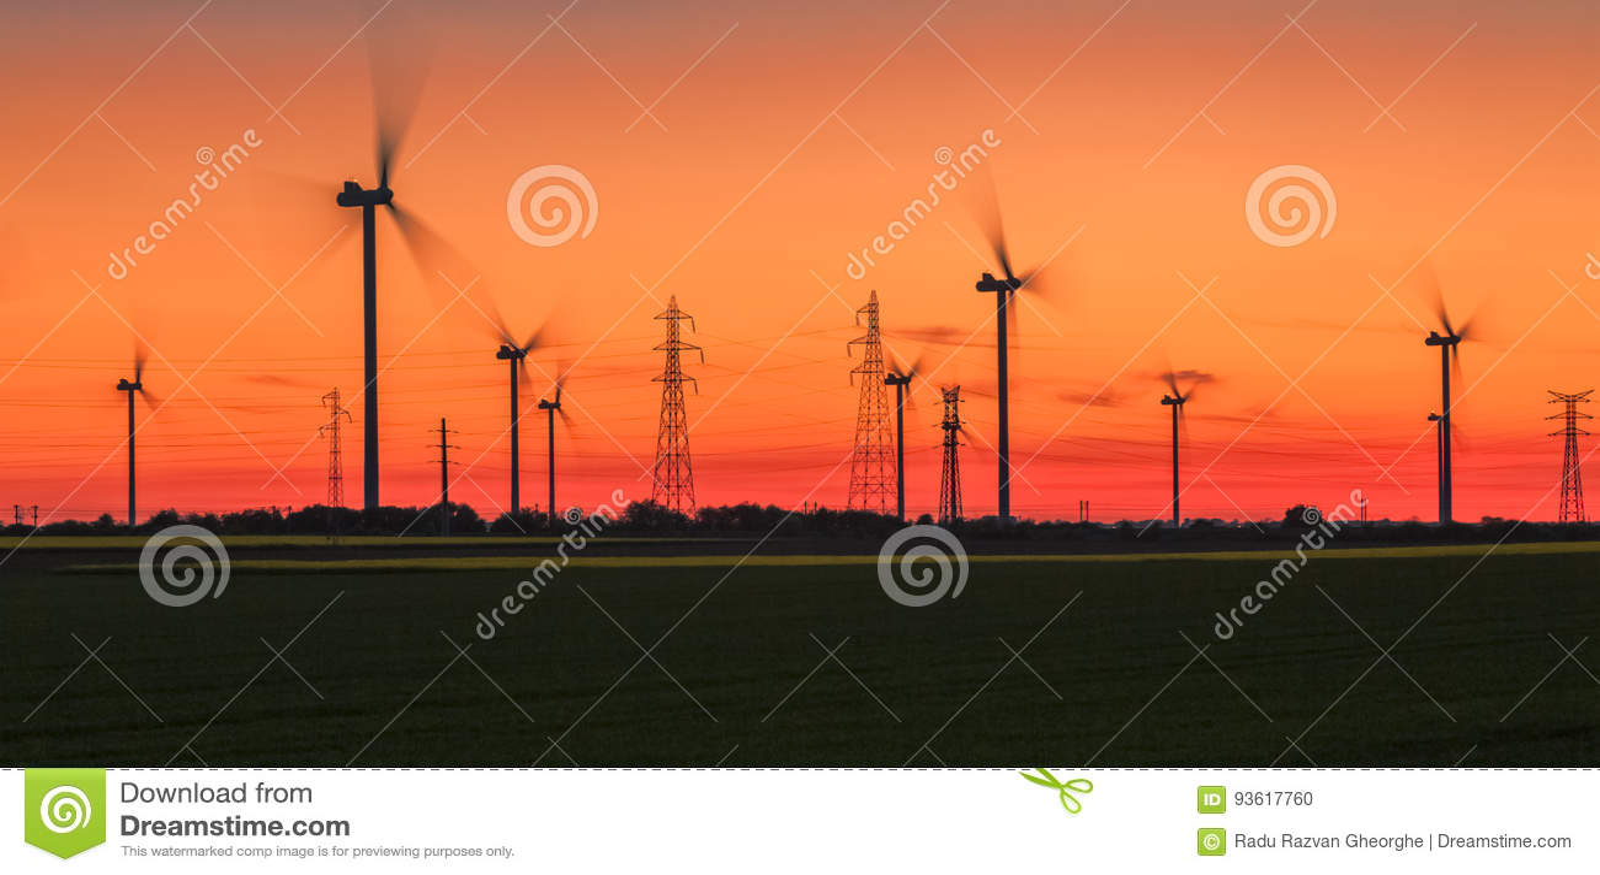 Energetic Sunset - Wind Energy